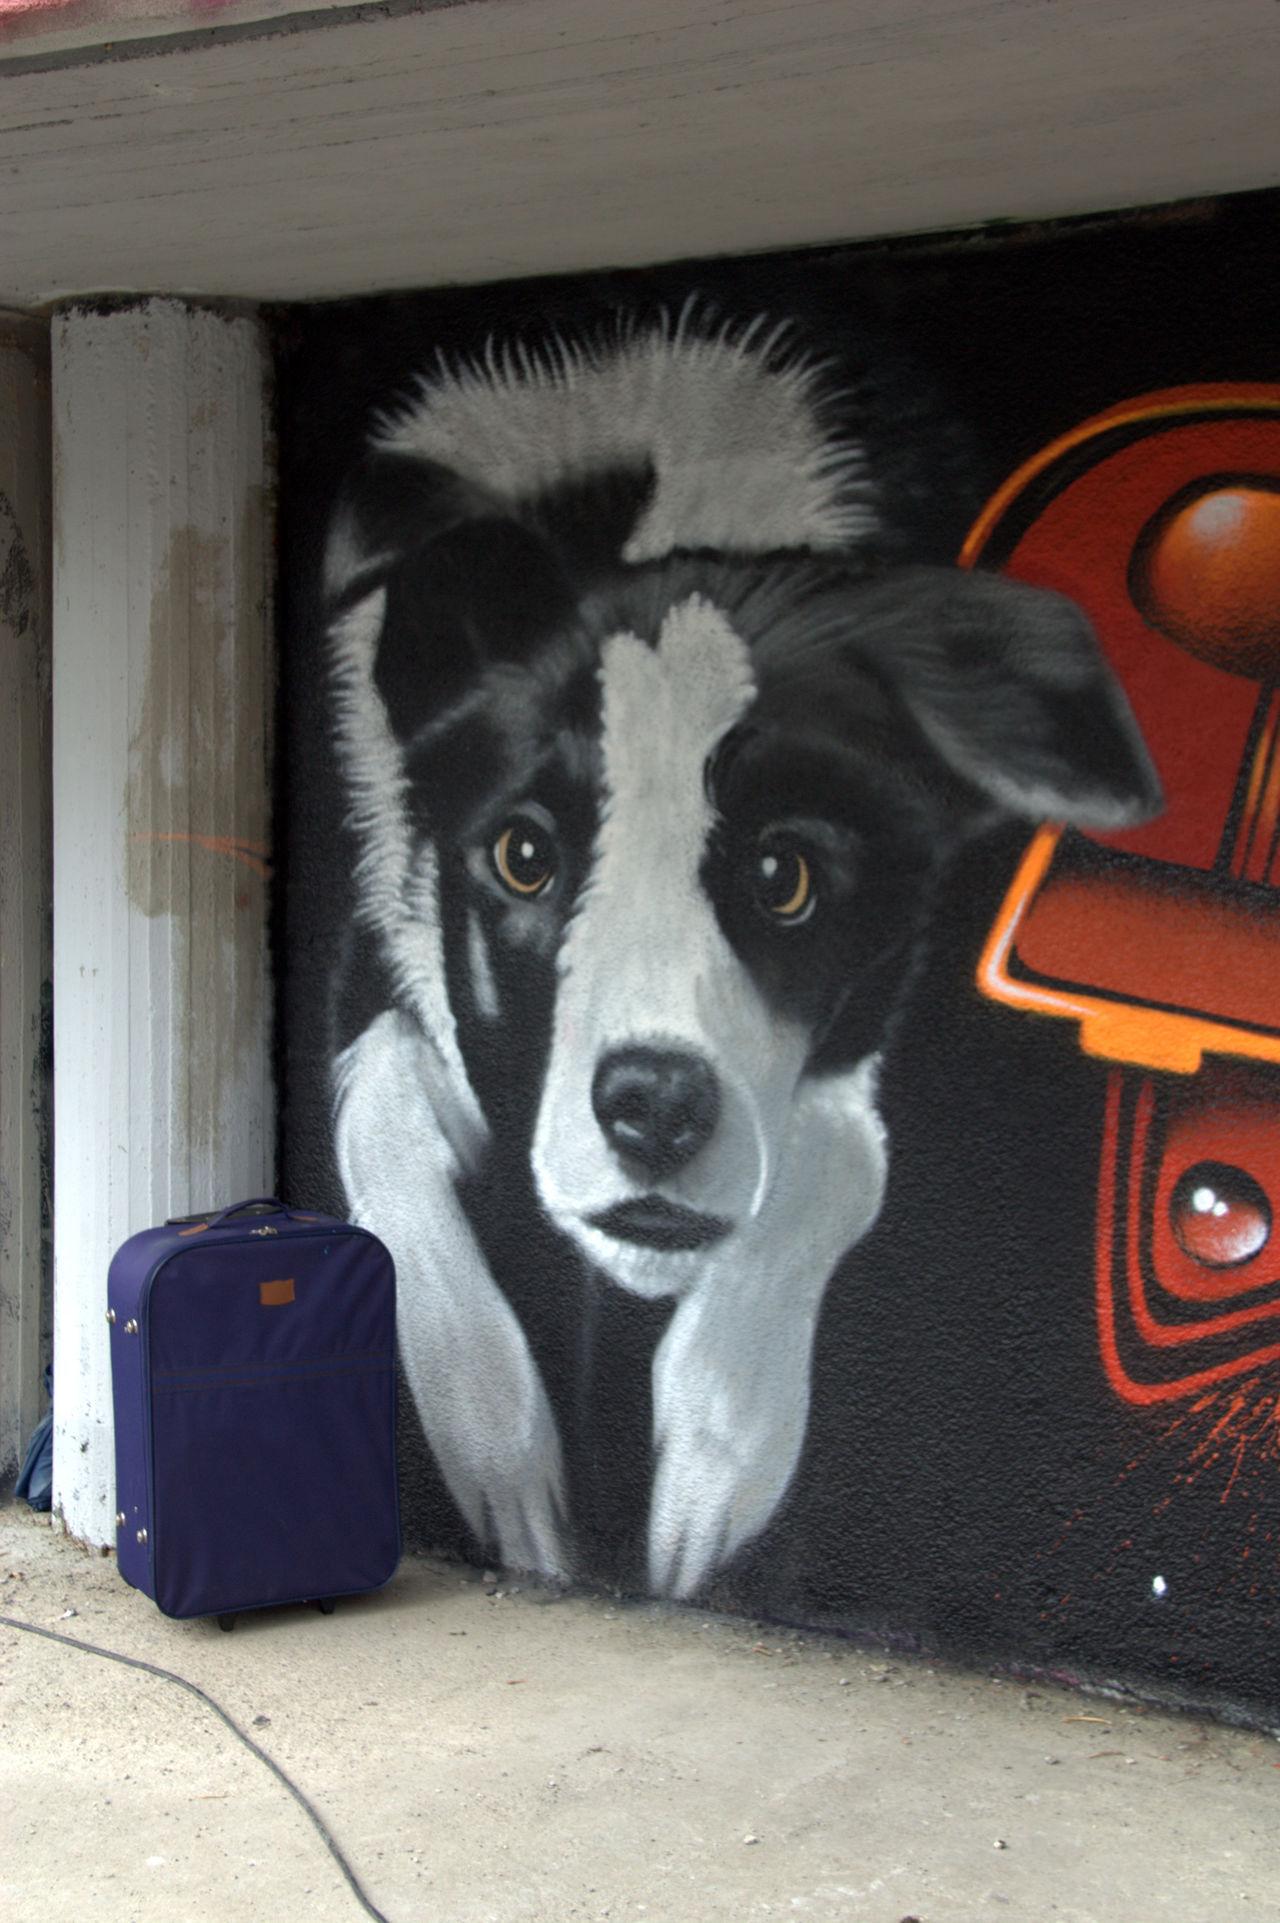 MOS 2016 (Meeting of Styles) 3D Art Colors Day Eyeem Art Lover EyeEm Gallery Graffiti Industrial Wall MOS 2016 (Meeting Of Styles) Murales Muralesart Outdoors Street Art Tag No Tag Tags Dog's Trolley